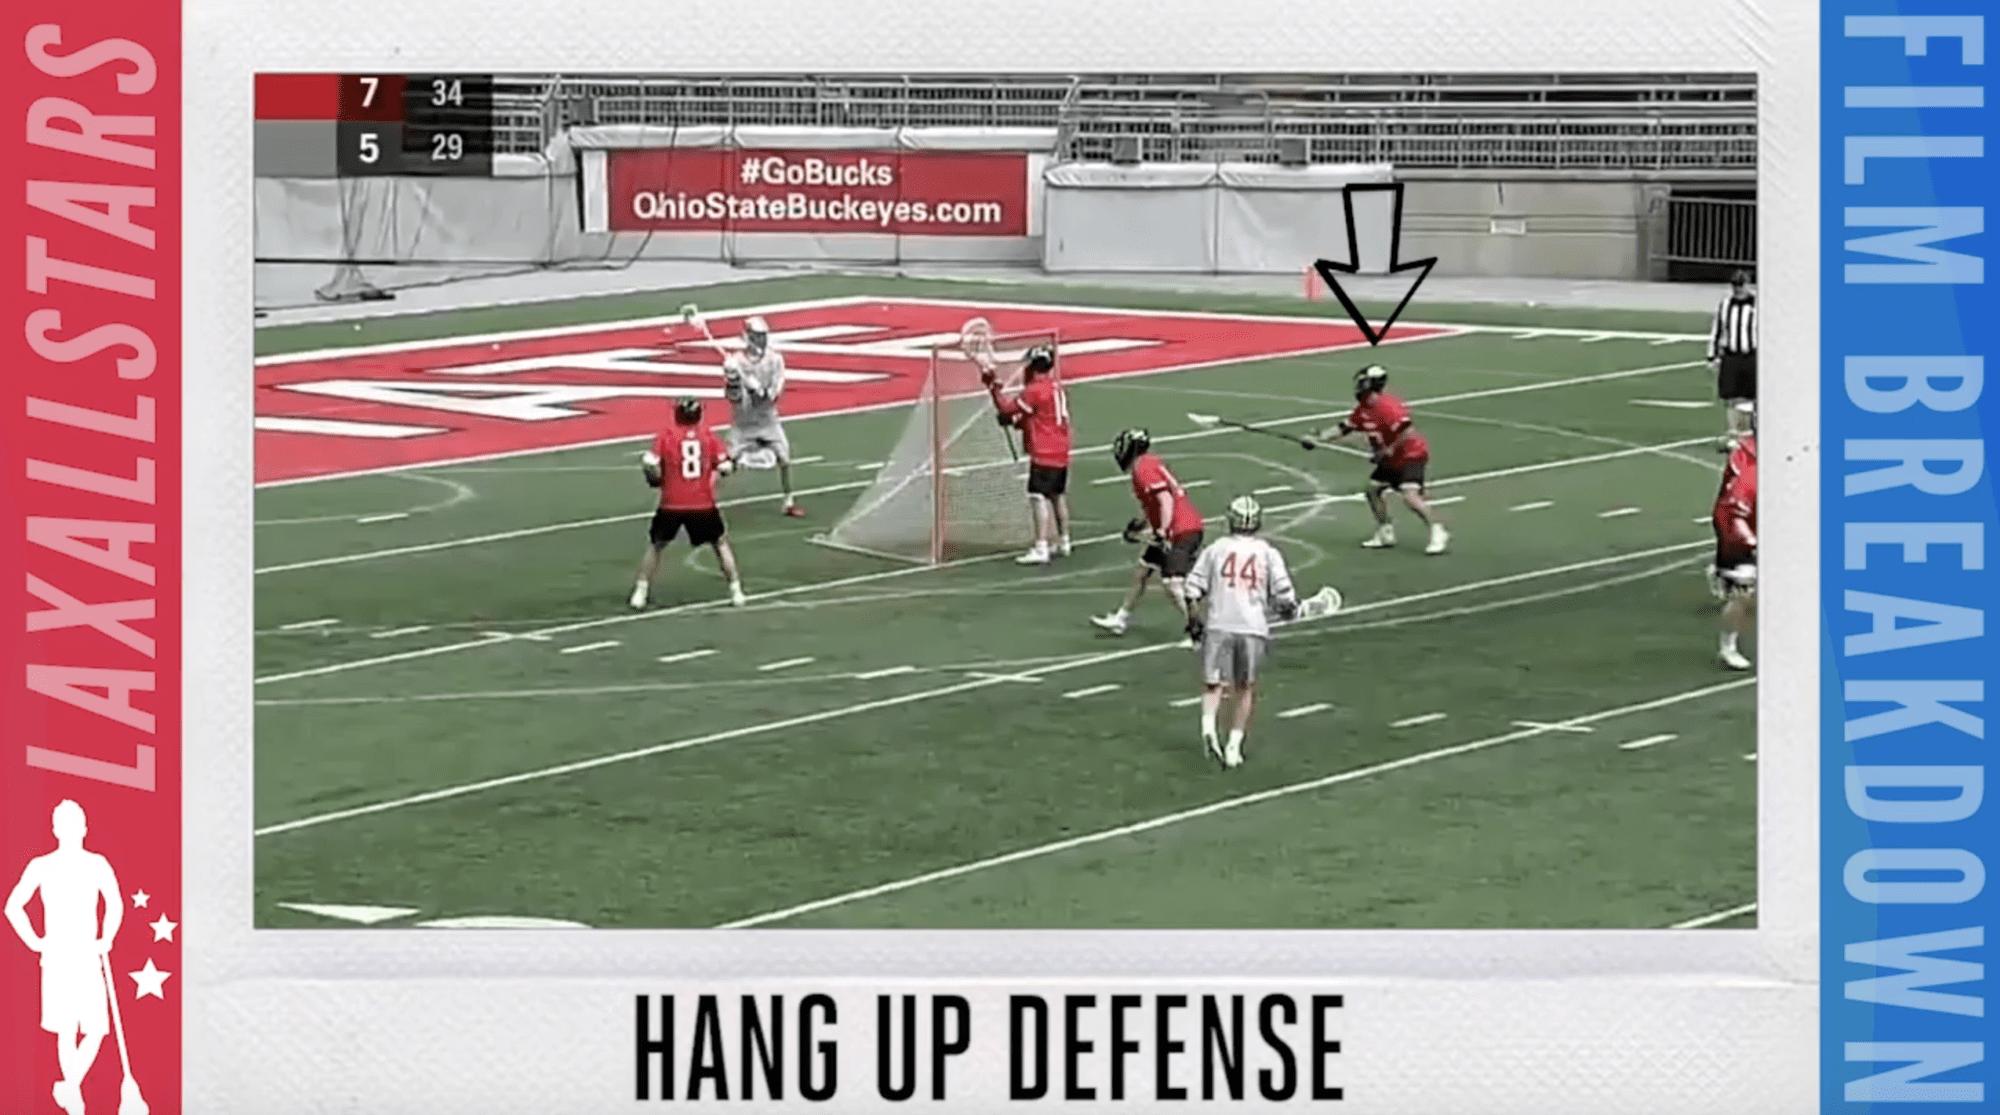 hang up defense maryland ohio state